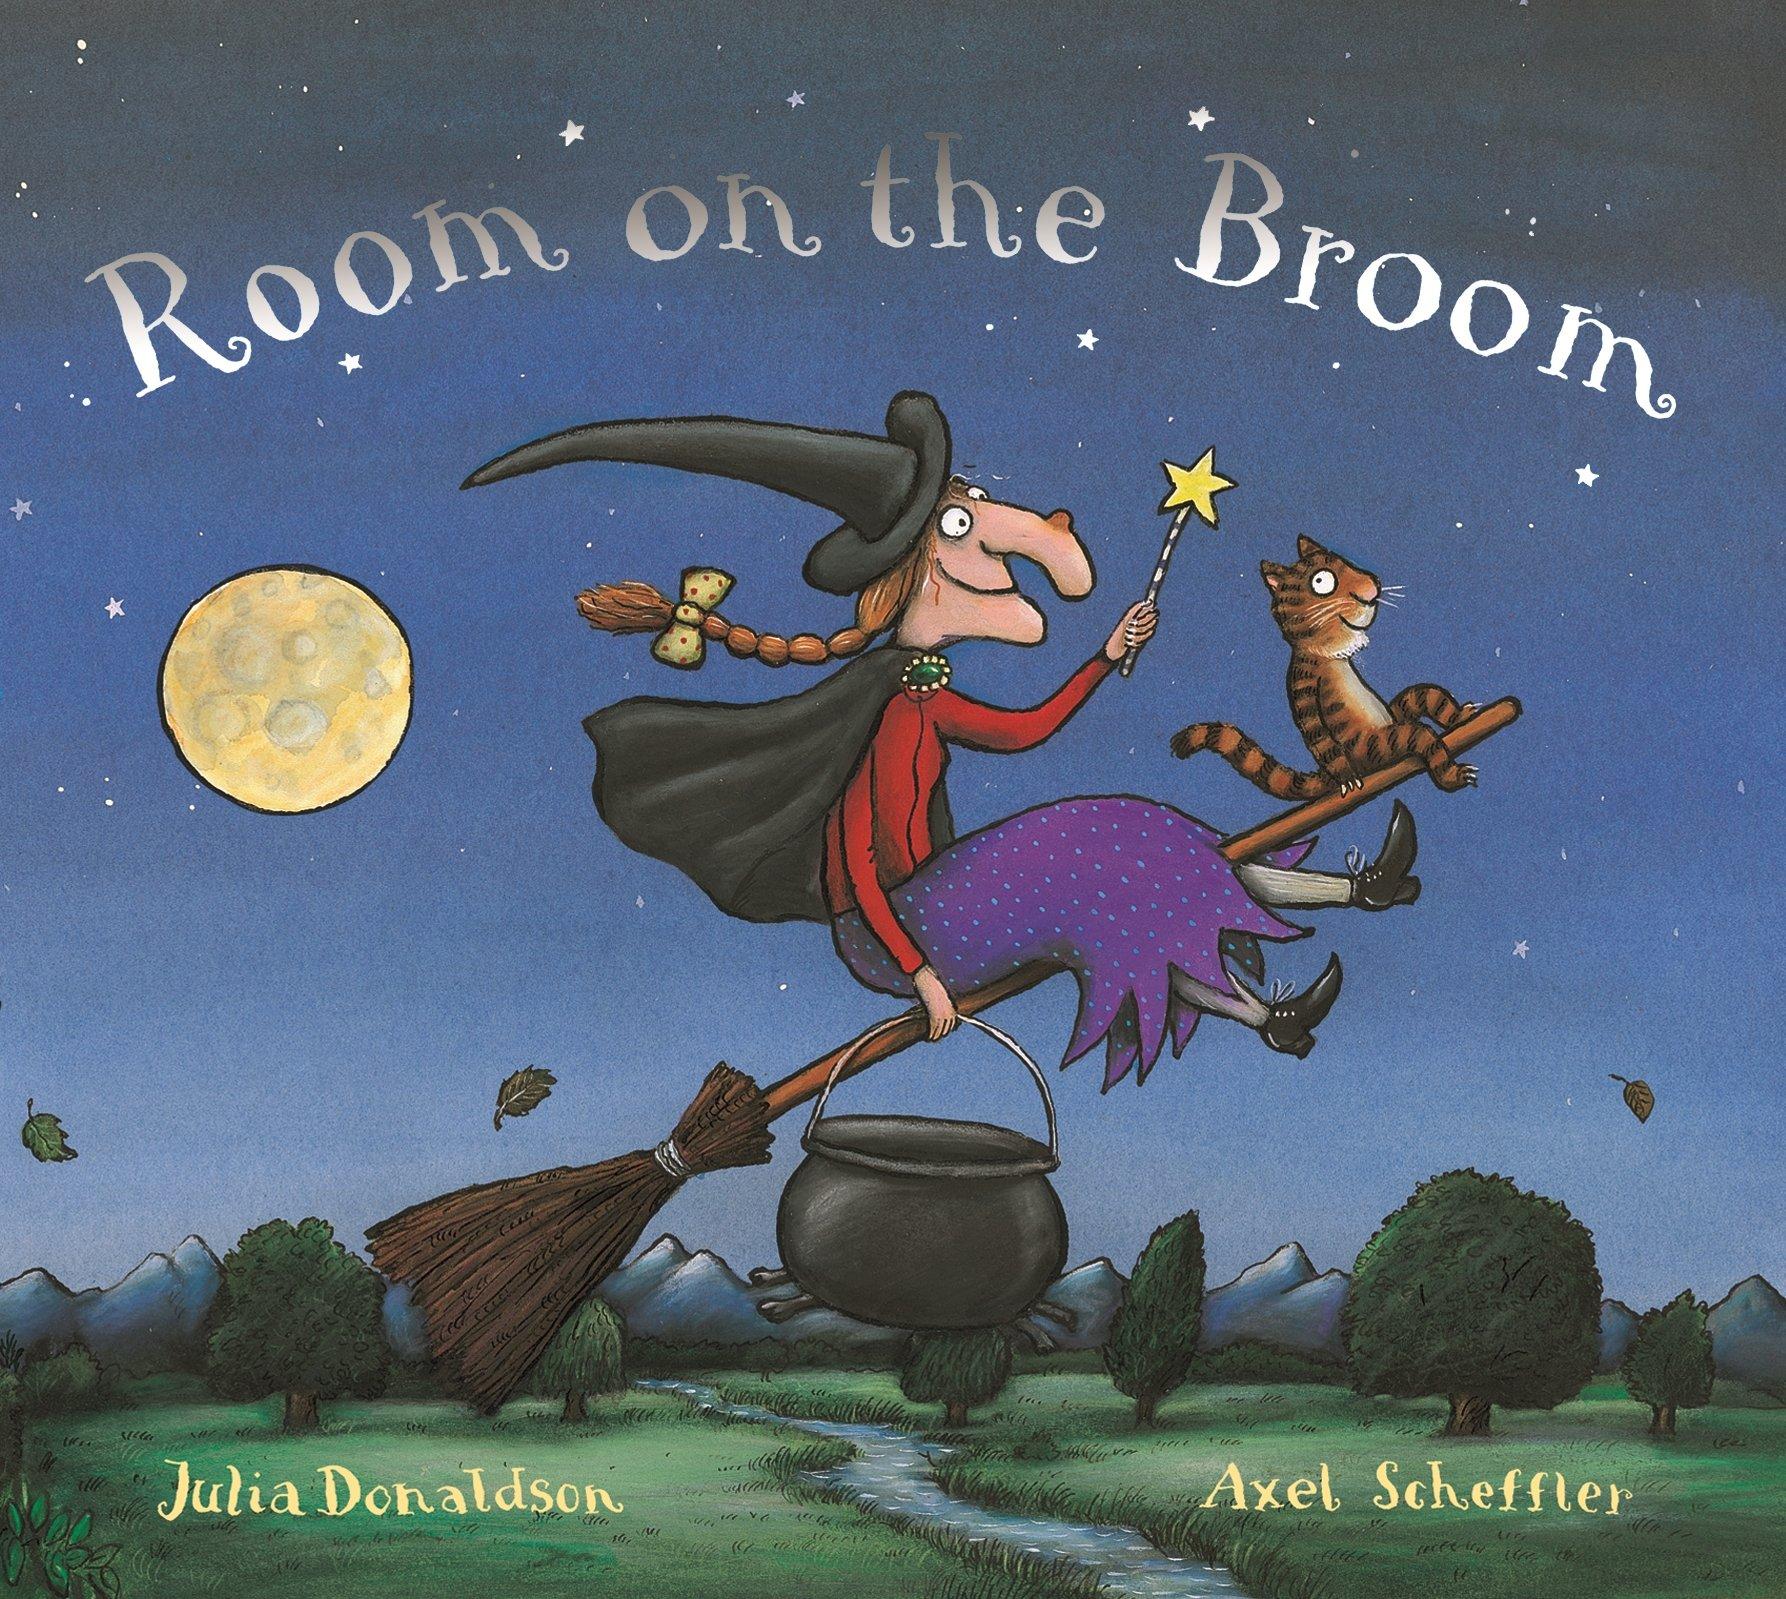 Room on the Broom: Amazon.co.uk: Donaldson, Julia, Scheffler, Axel: Books